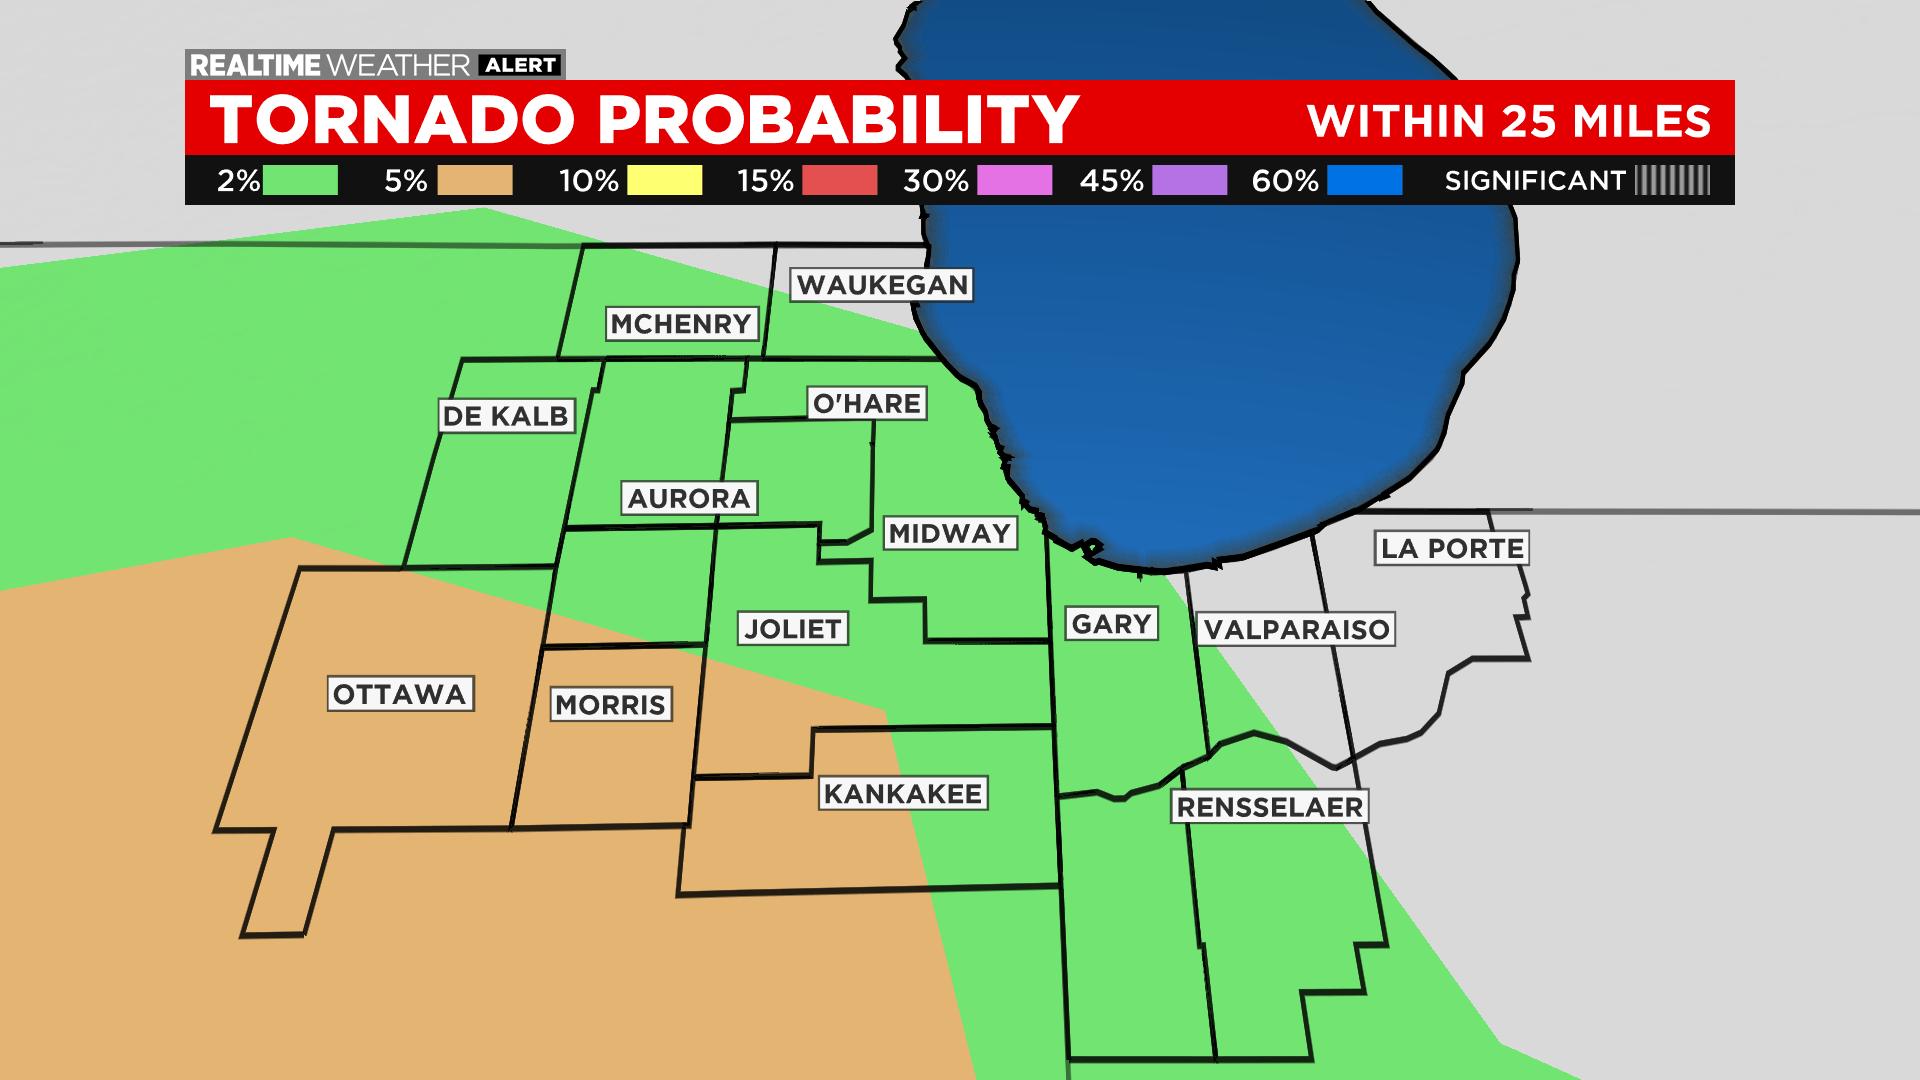 Tornado Probability: 05.03.21